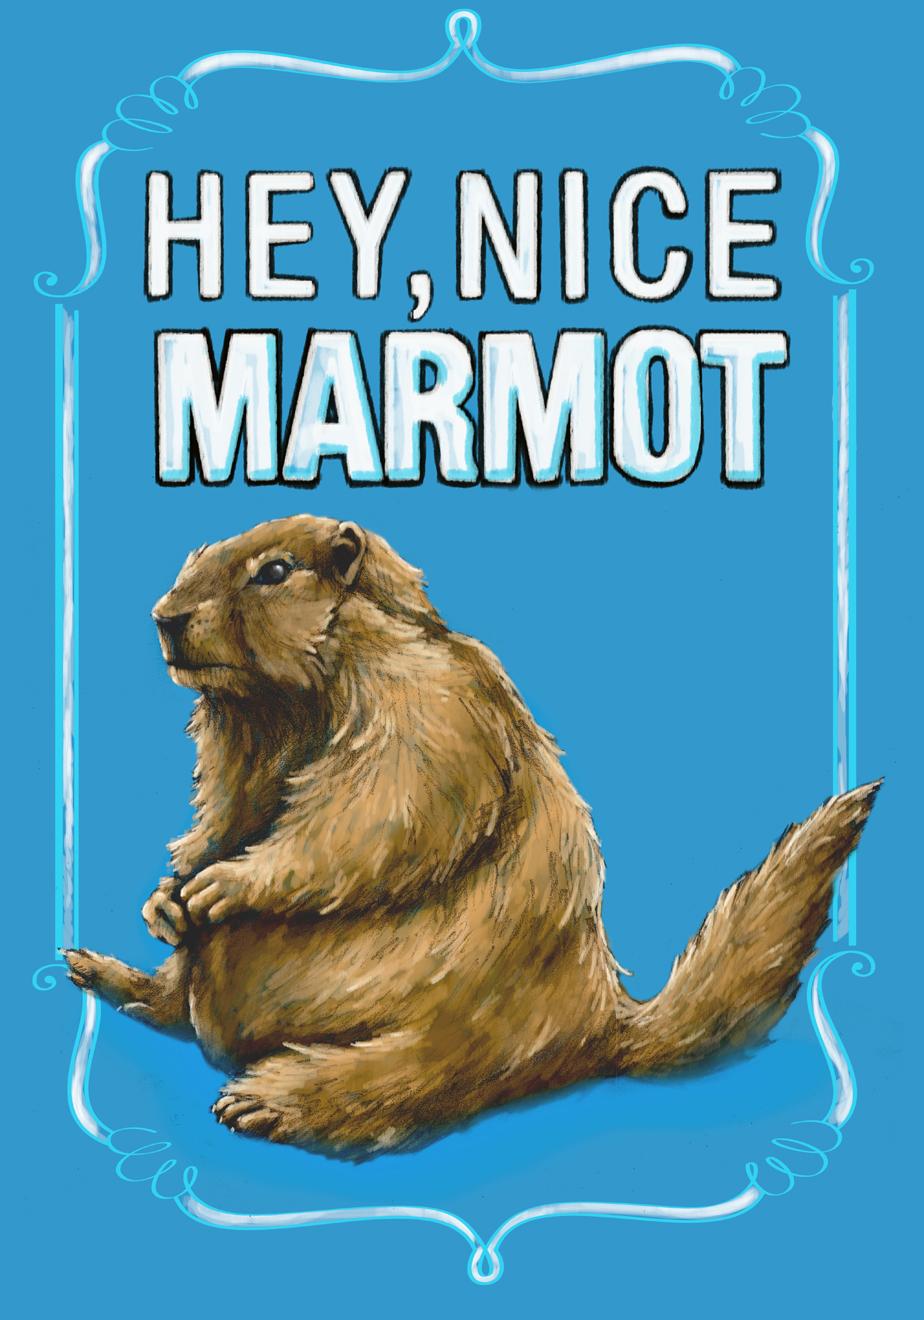 """Hey, nice marmot"" from The Big Lebowski"